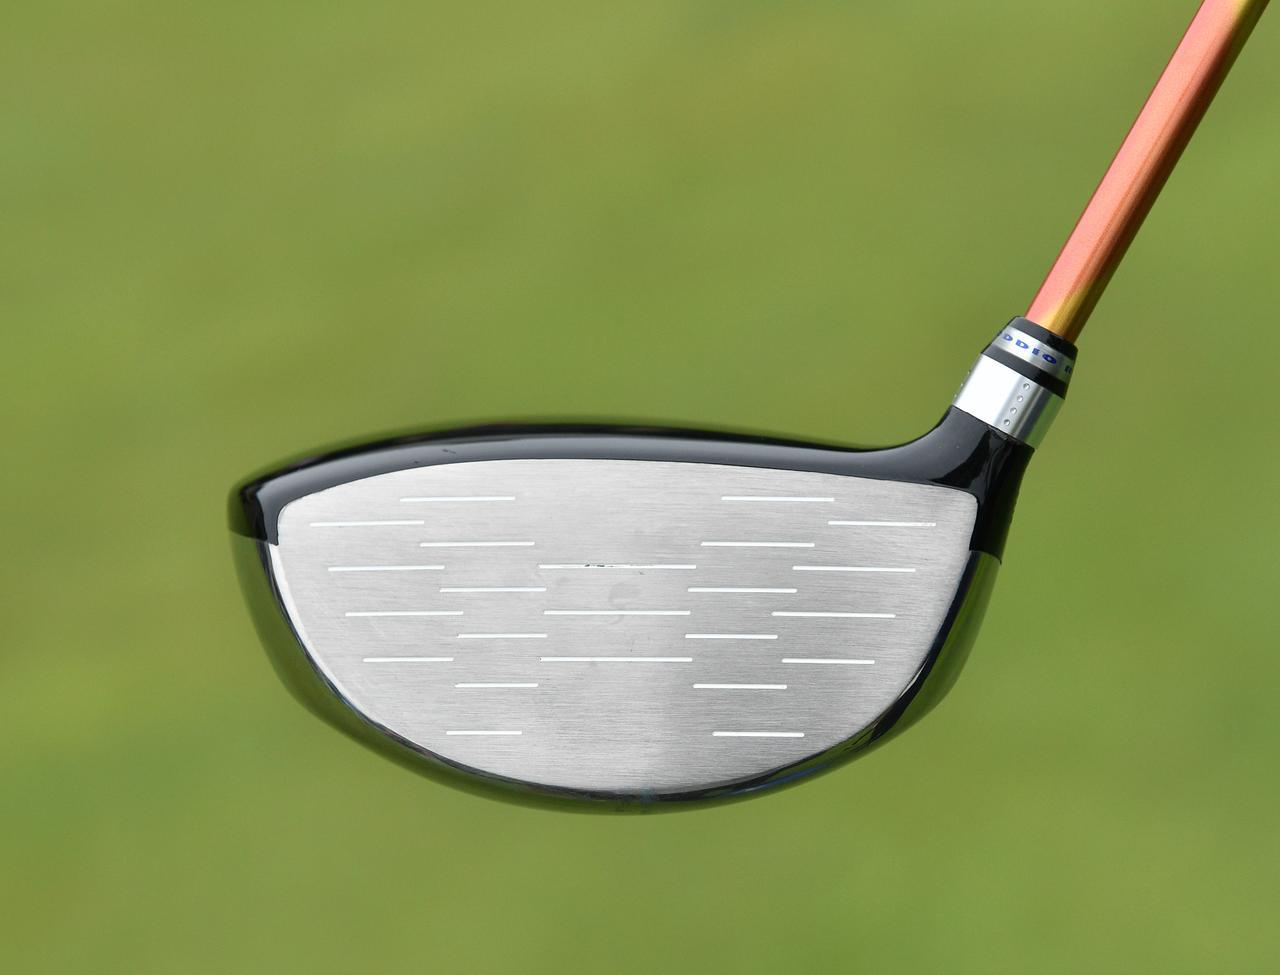 Images : 3番目の画像 - 岡山絵里の14本 - みんなのゴルフダイジェスト